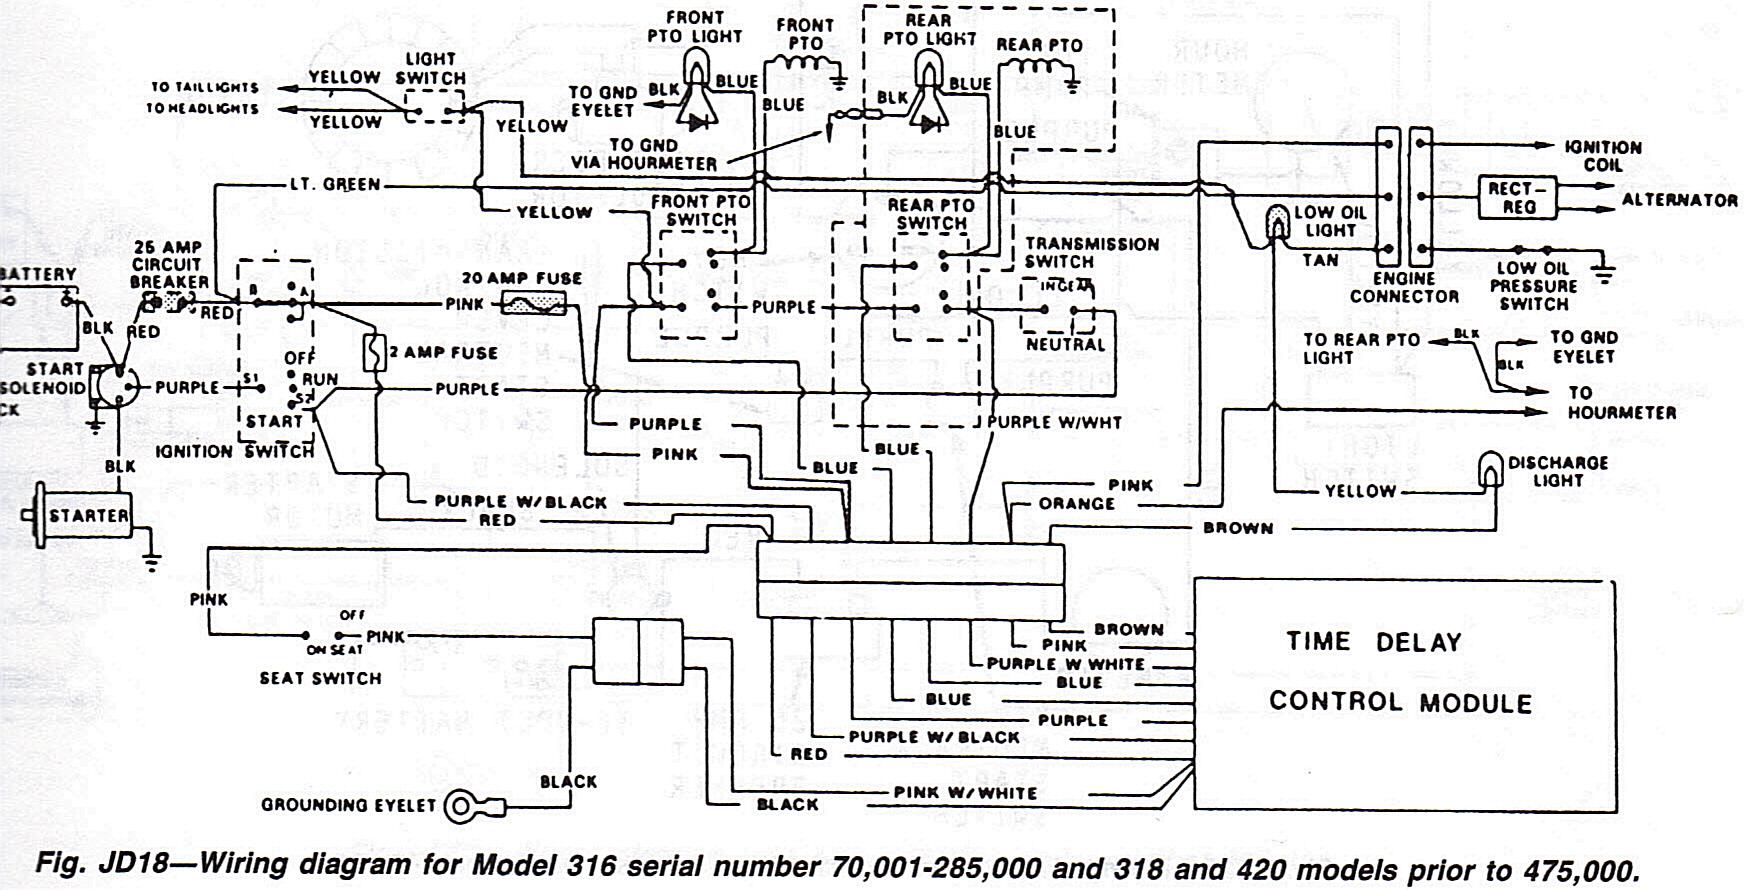 John Deere 20 Hp Onan Wiring Diagram All Kind Of Diagrams Honda Small Engine Circuit Symbols U2022 Rh Blogospheree Com